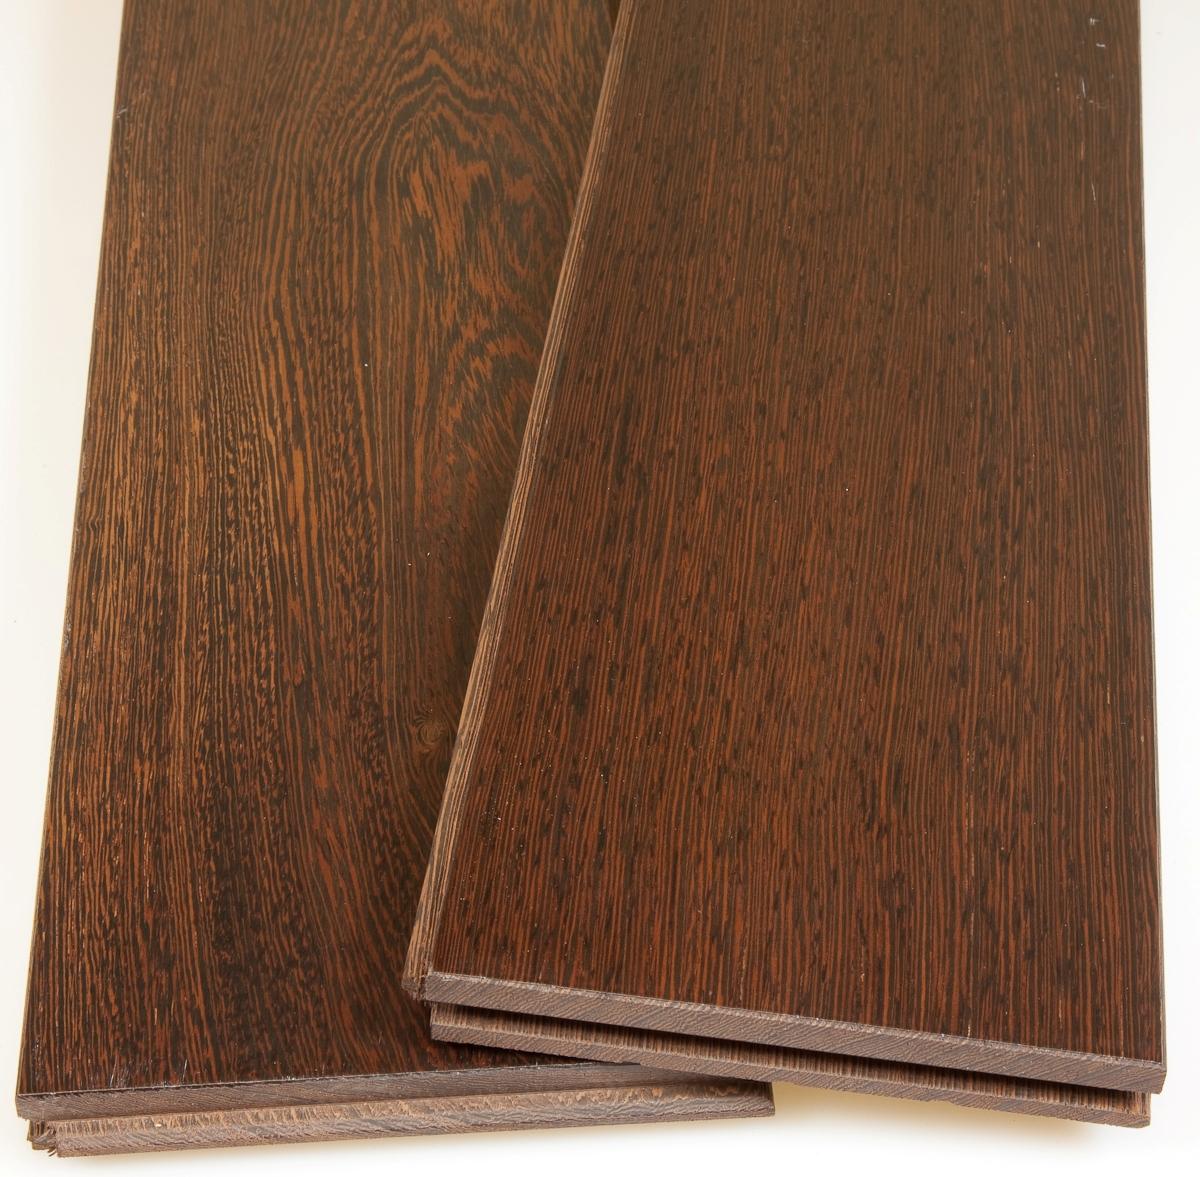 Wenge Exotic Hardwood Flooring Lumber